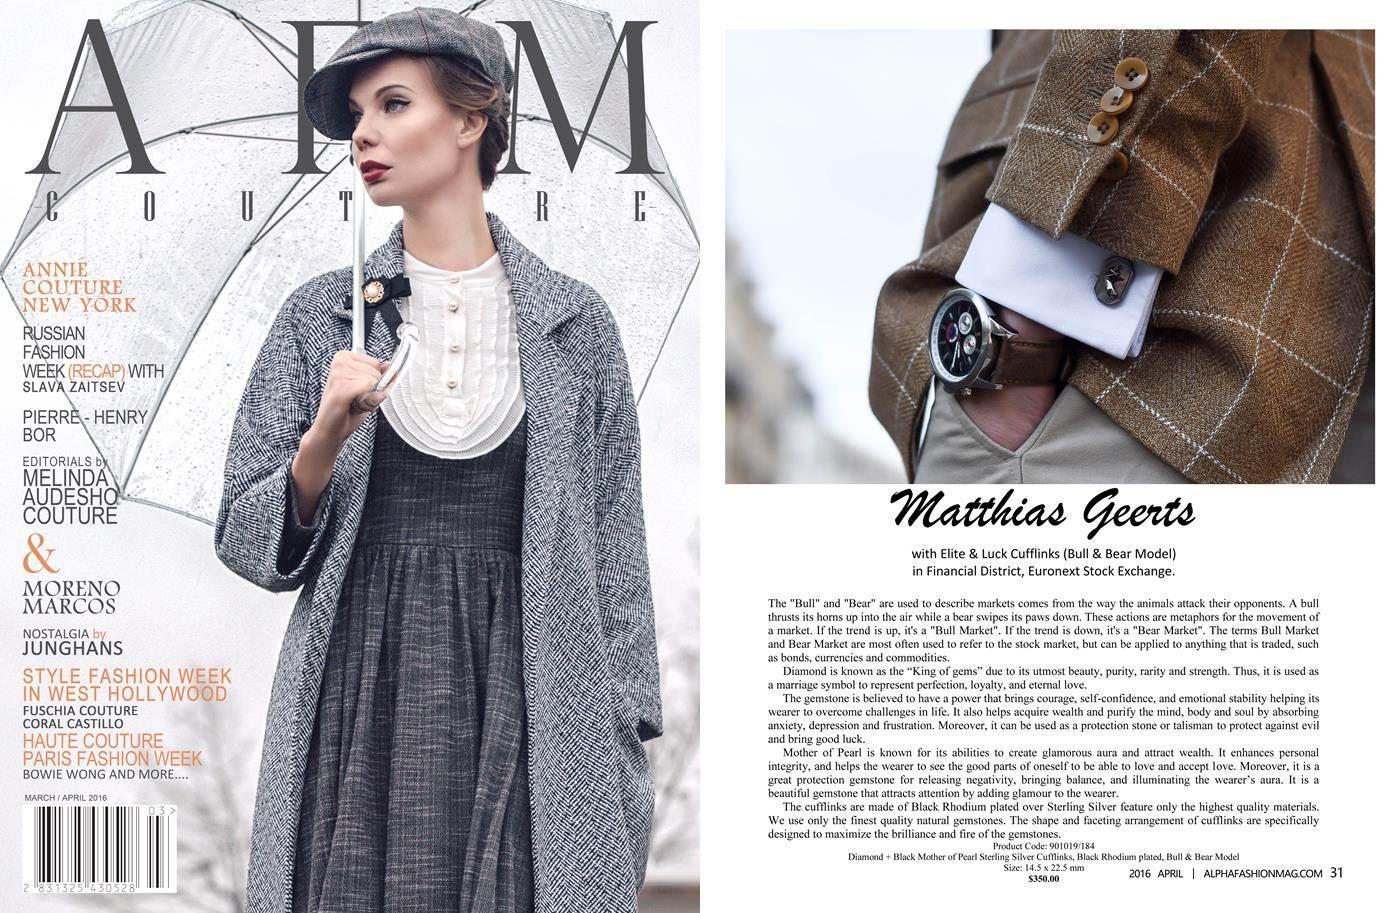 Elite & Luck Cufflinks ในนิตยสาร Alpha Fashion Magazine (Couture) ที่ New York ฉบับเดือนเมษายน 2016.